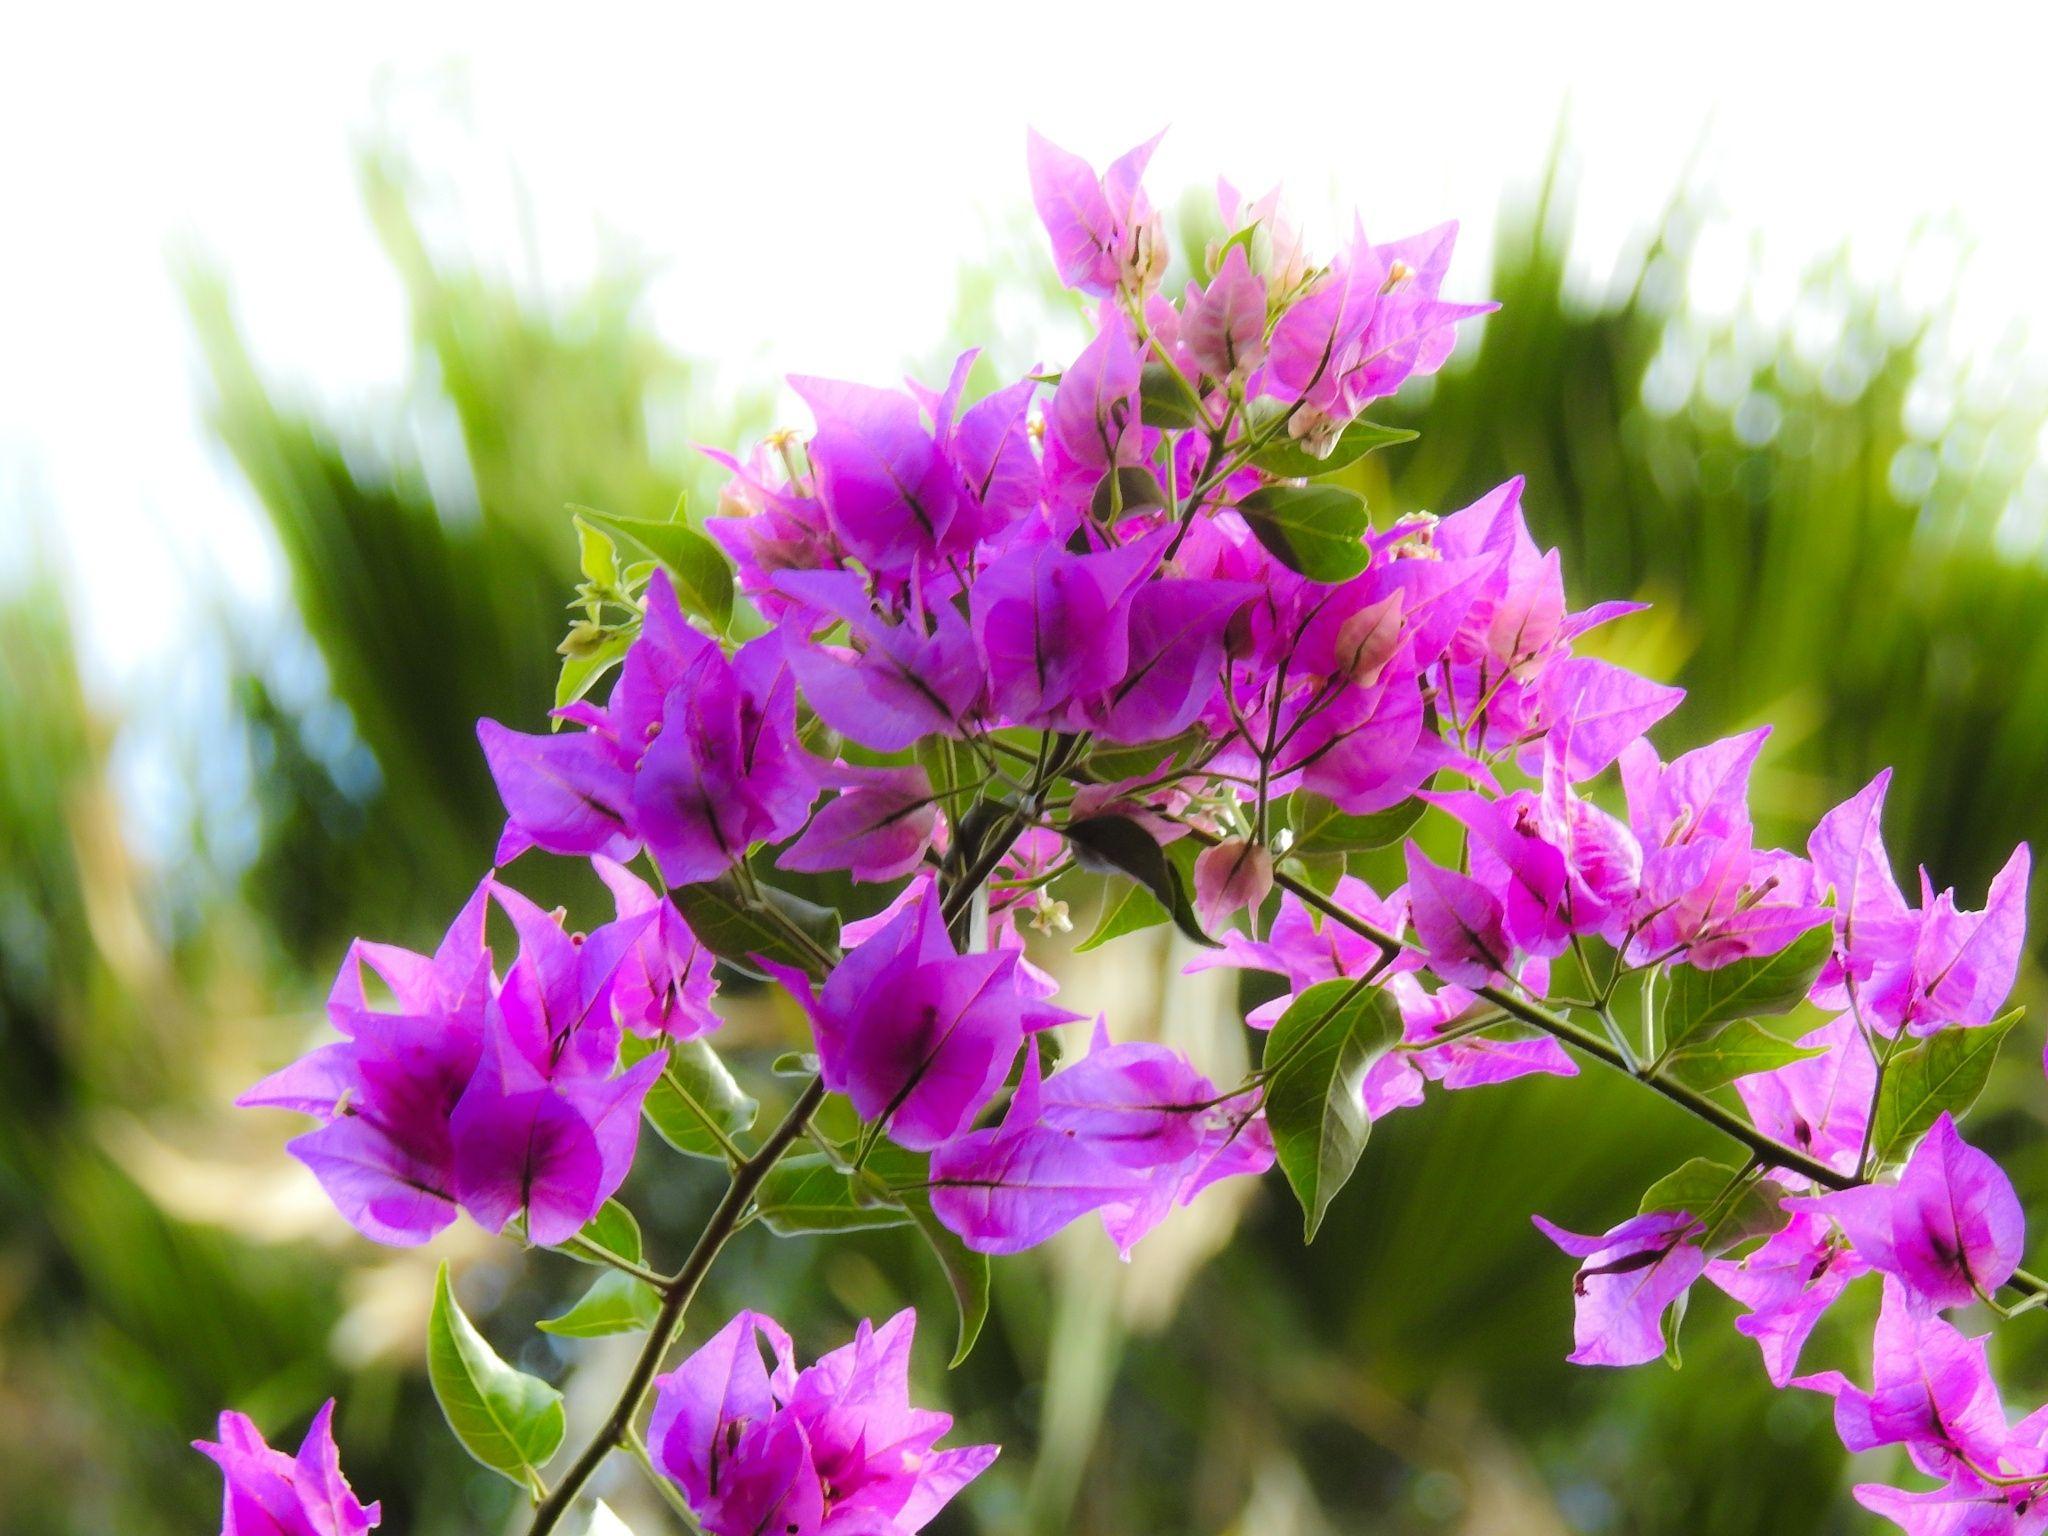 Hawaiian flowers trees 4 exploring oahu away from waikiki i hawaiian flowers trees 4 exploring oahu away from waikiki i discovered flowers izmirmasajfo Images